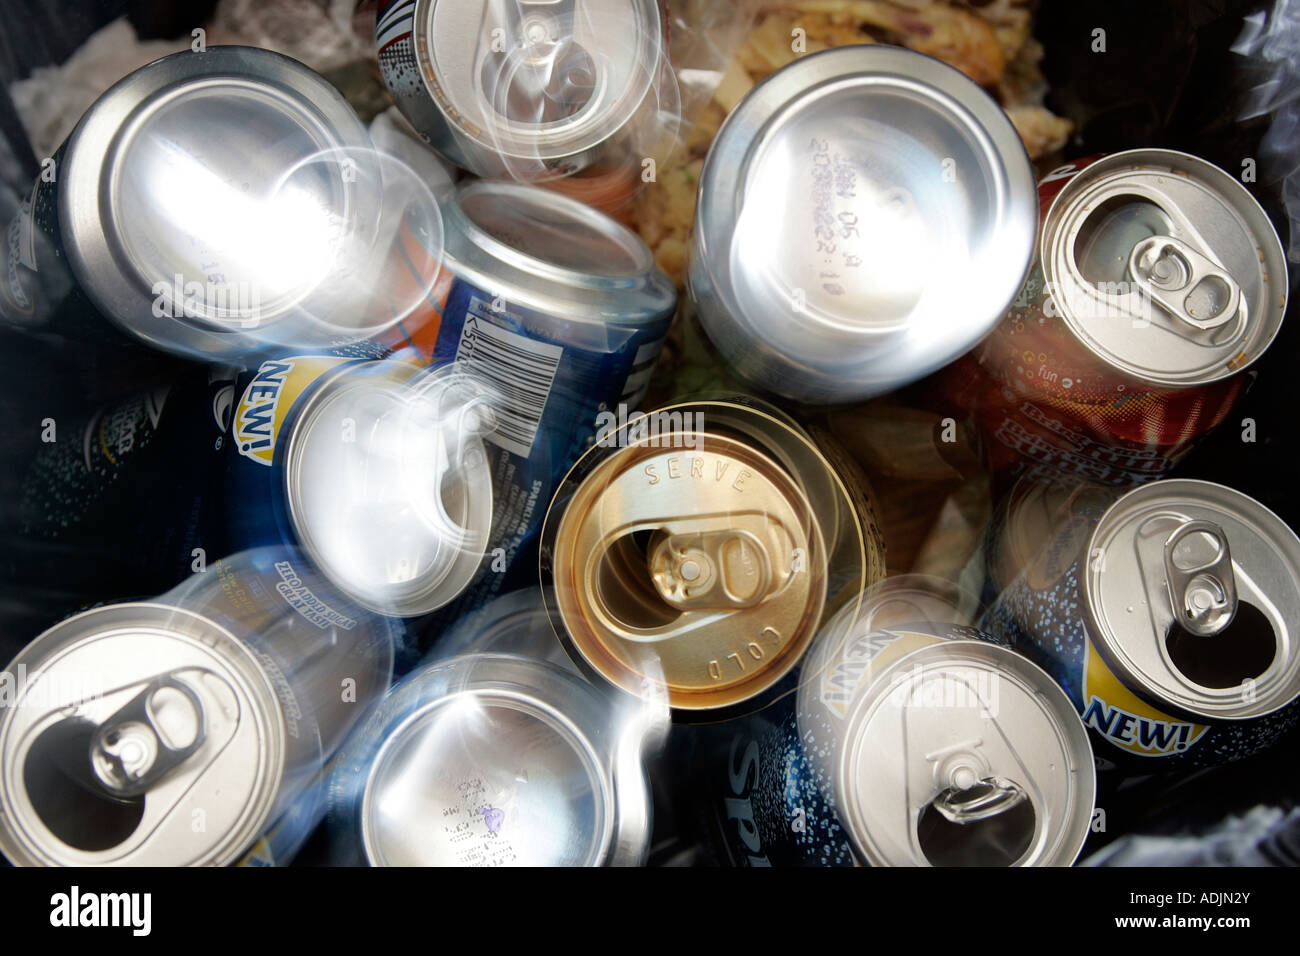 recycling aluminium cans - Stock Image